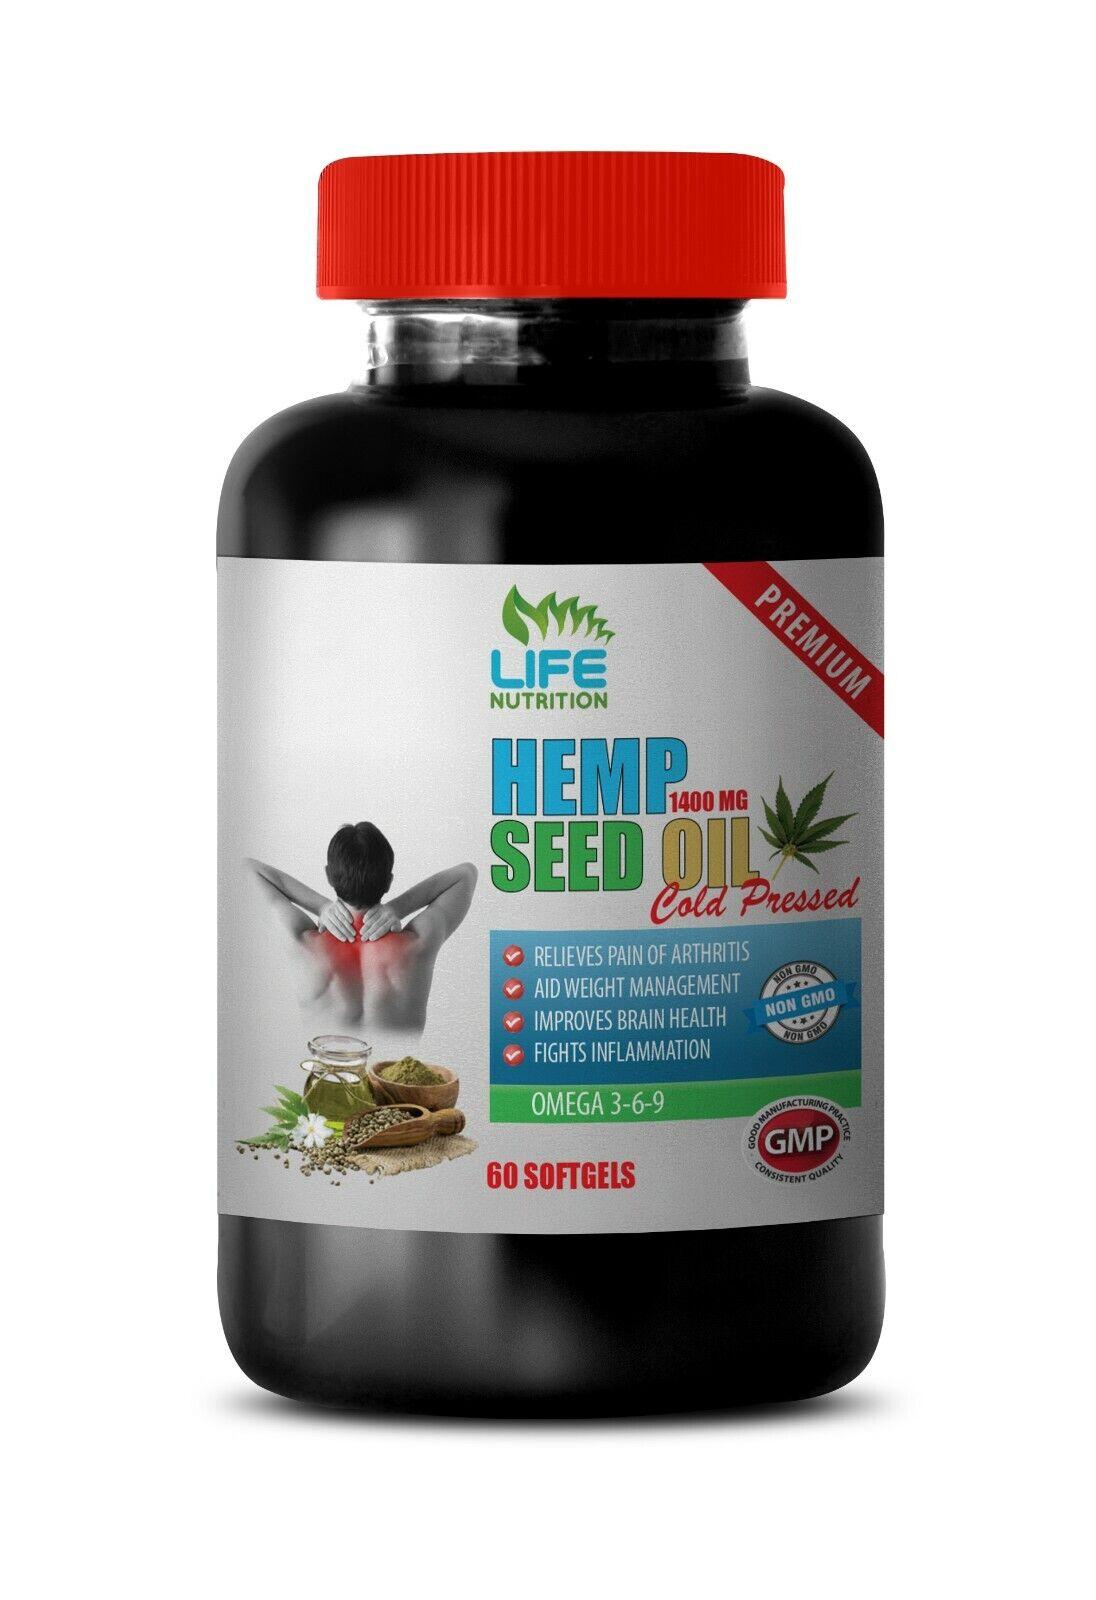 weight management supplement, ORGANIC HEMP SEED OIL 1400 improve brain health 1B